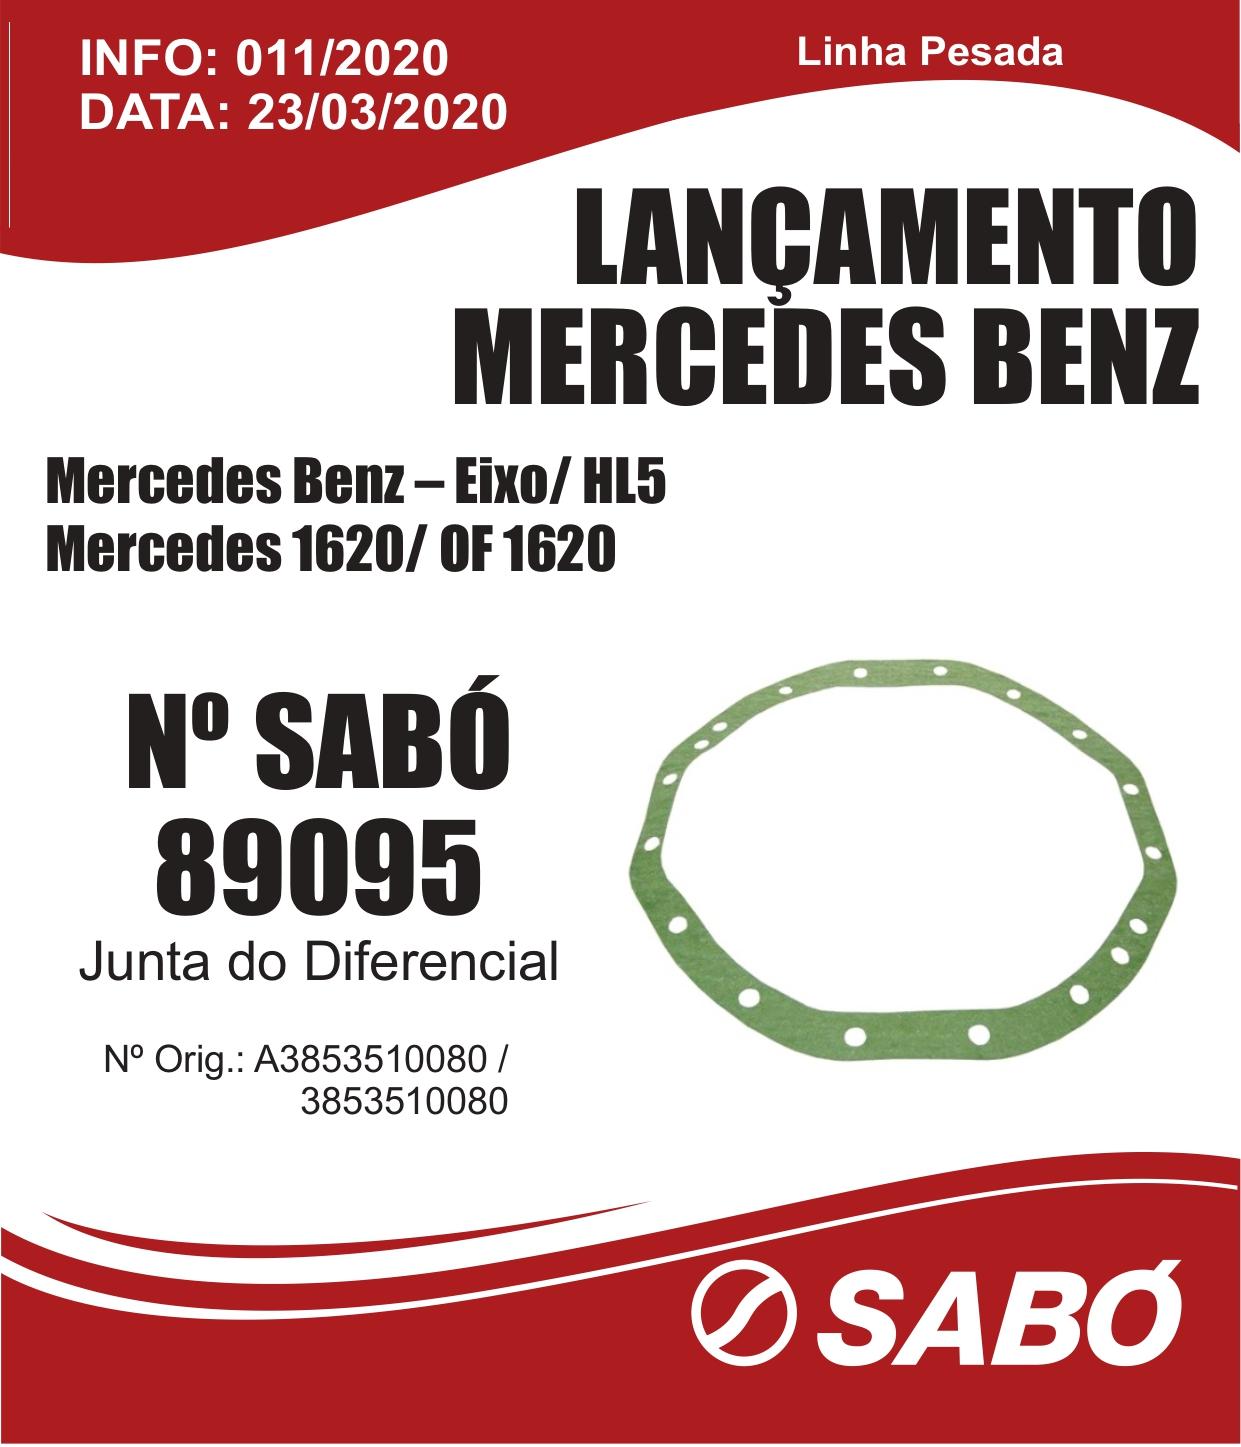 Info 011 - Mercedes Benz_page-0001